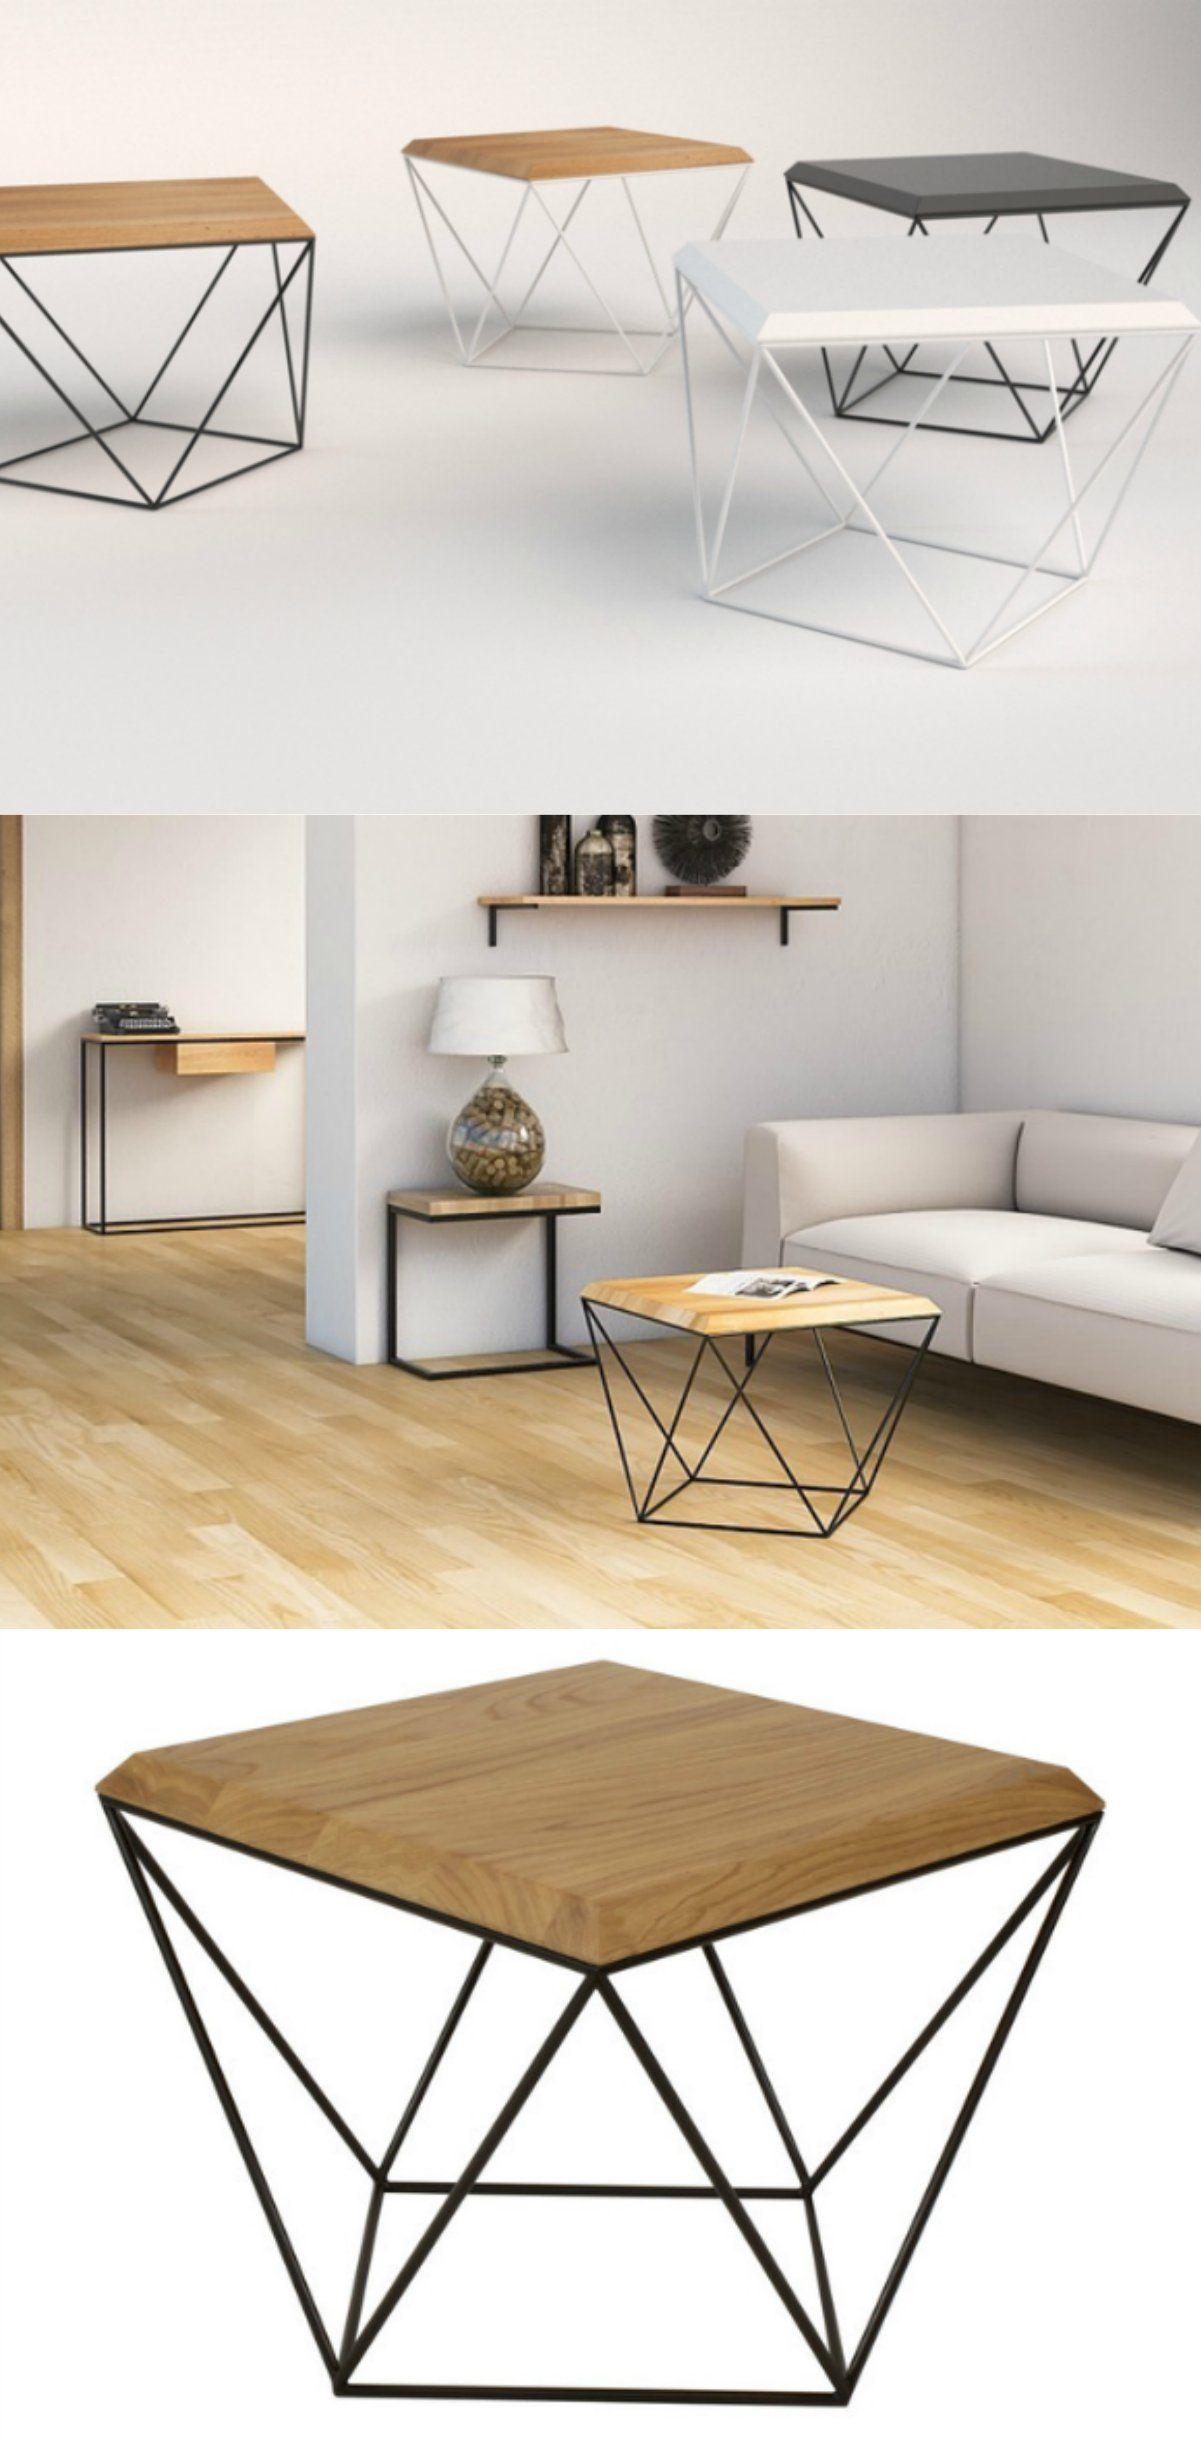 Tulip Wood Scandinavian Style Coffee Table Muebles Muebles Minimalistas Diseno De Muebles [ 2443 x 1201 Pixel ]